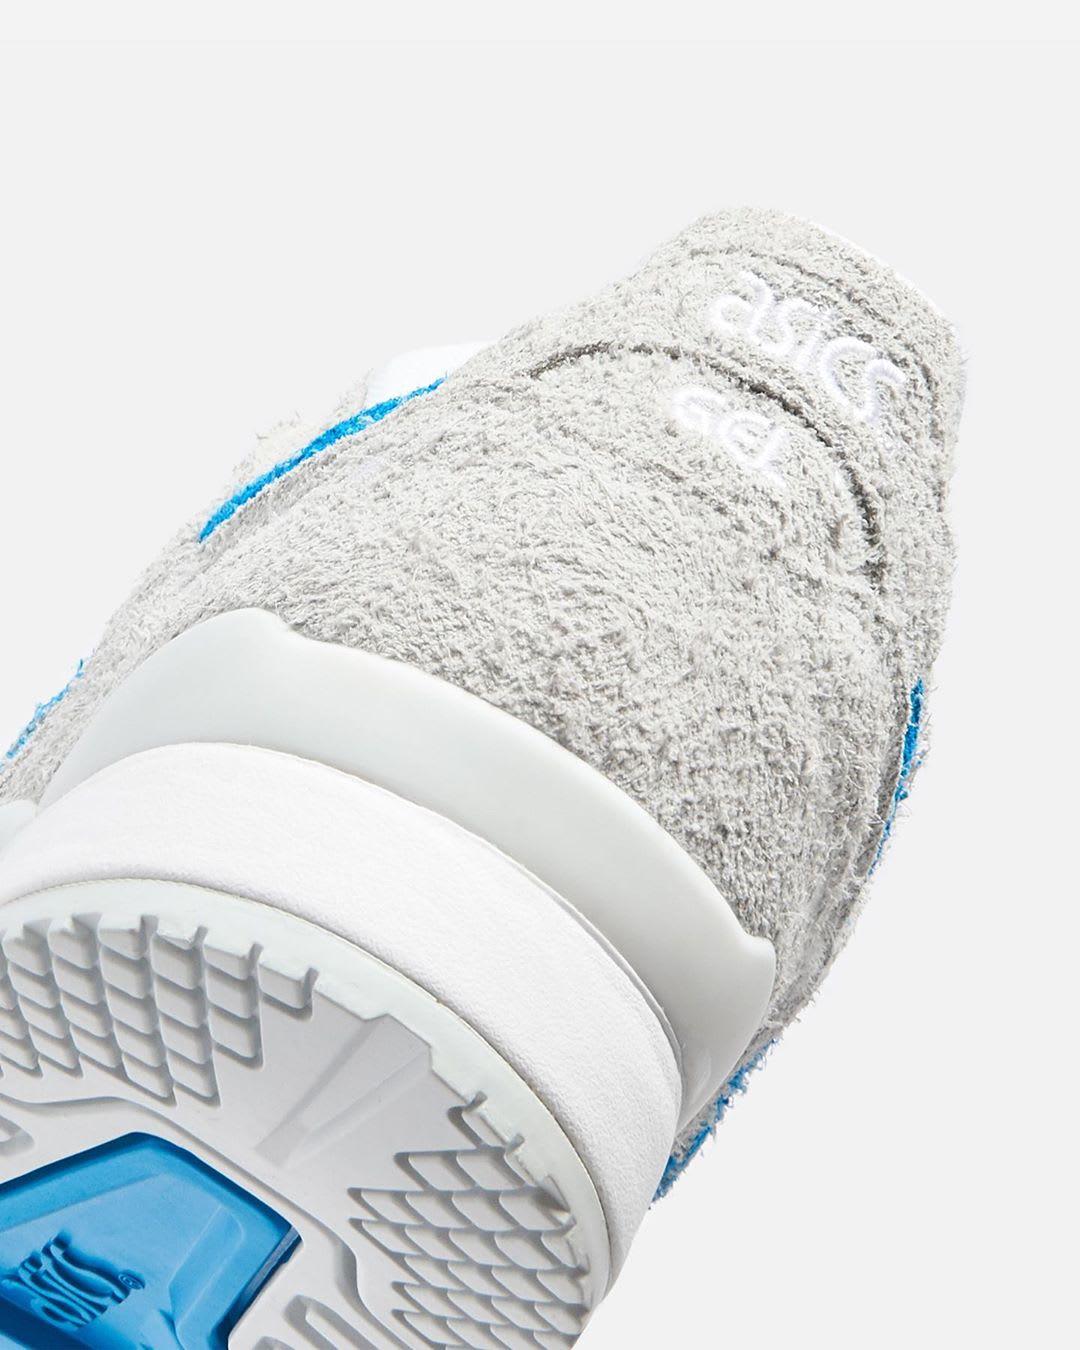 kith-asics-gel-lyte-3-super-blue-2019-heel